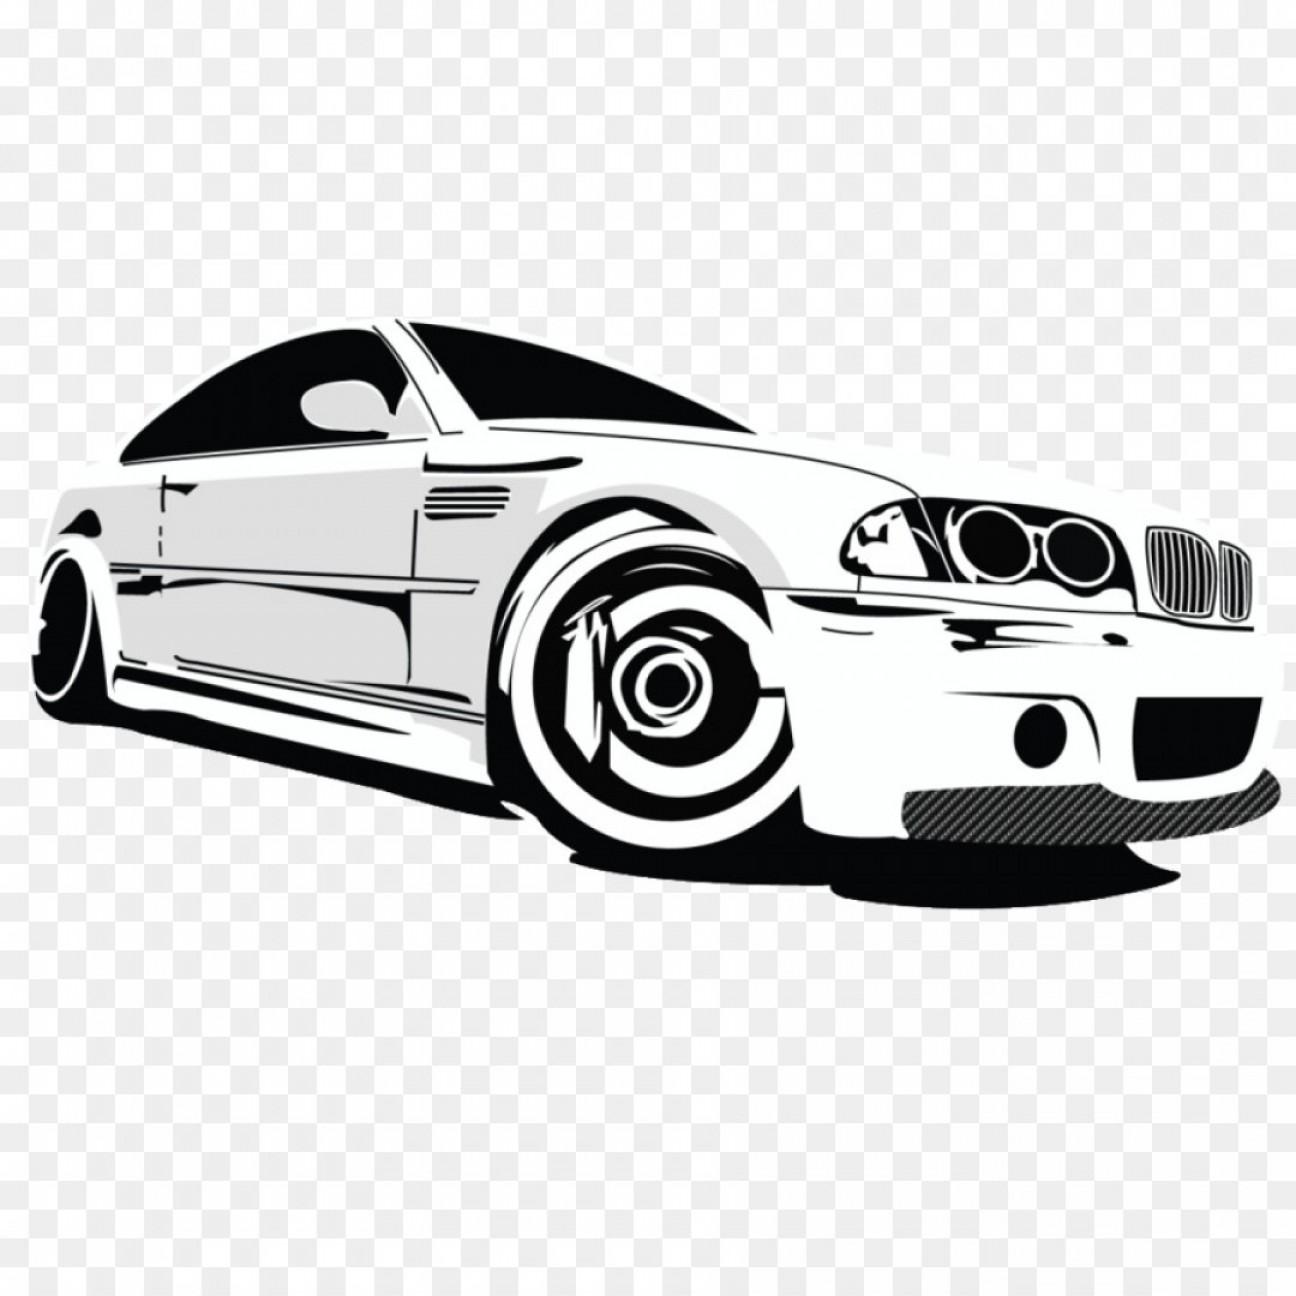 Png Bmw M Bmw Series Car Bmw Series Bmw.